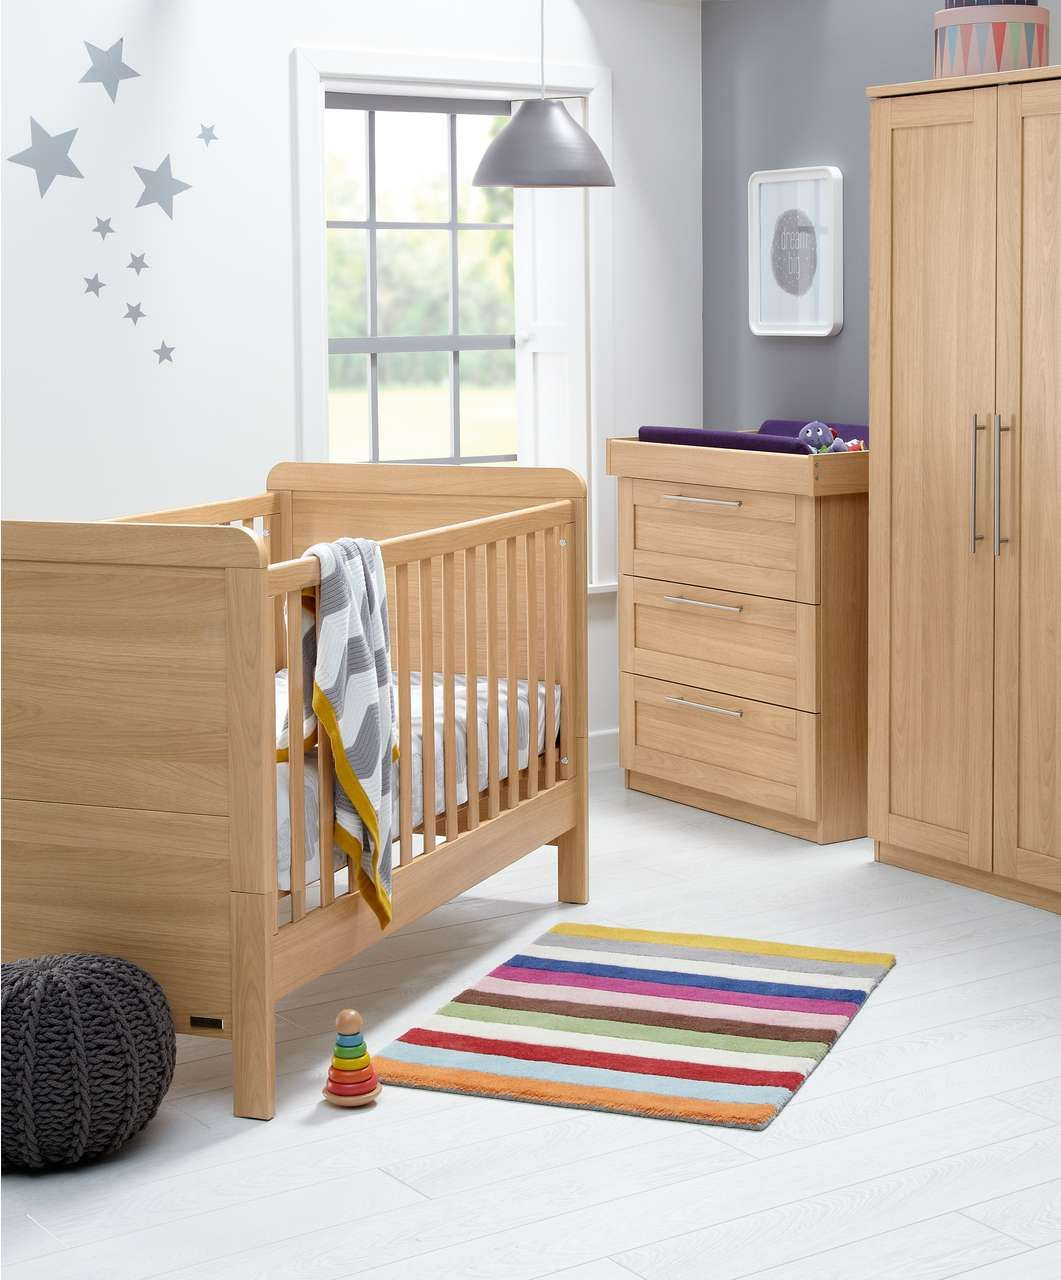 Mamas And Papas Bedroom Furniture Rialto 3 Piece Set Natural Oak Contemporary Mamas Papas